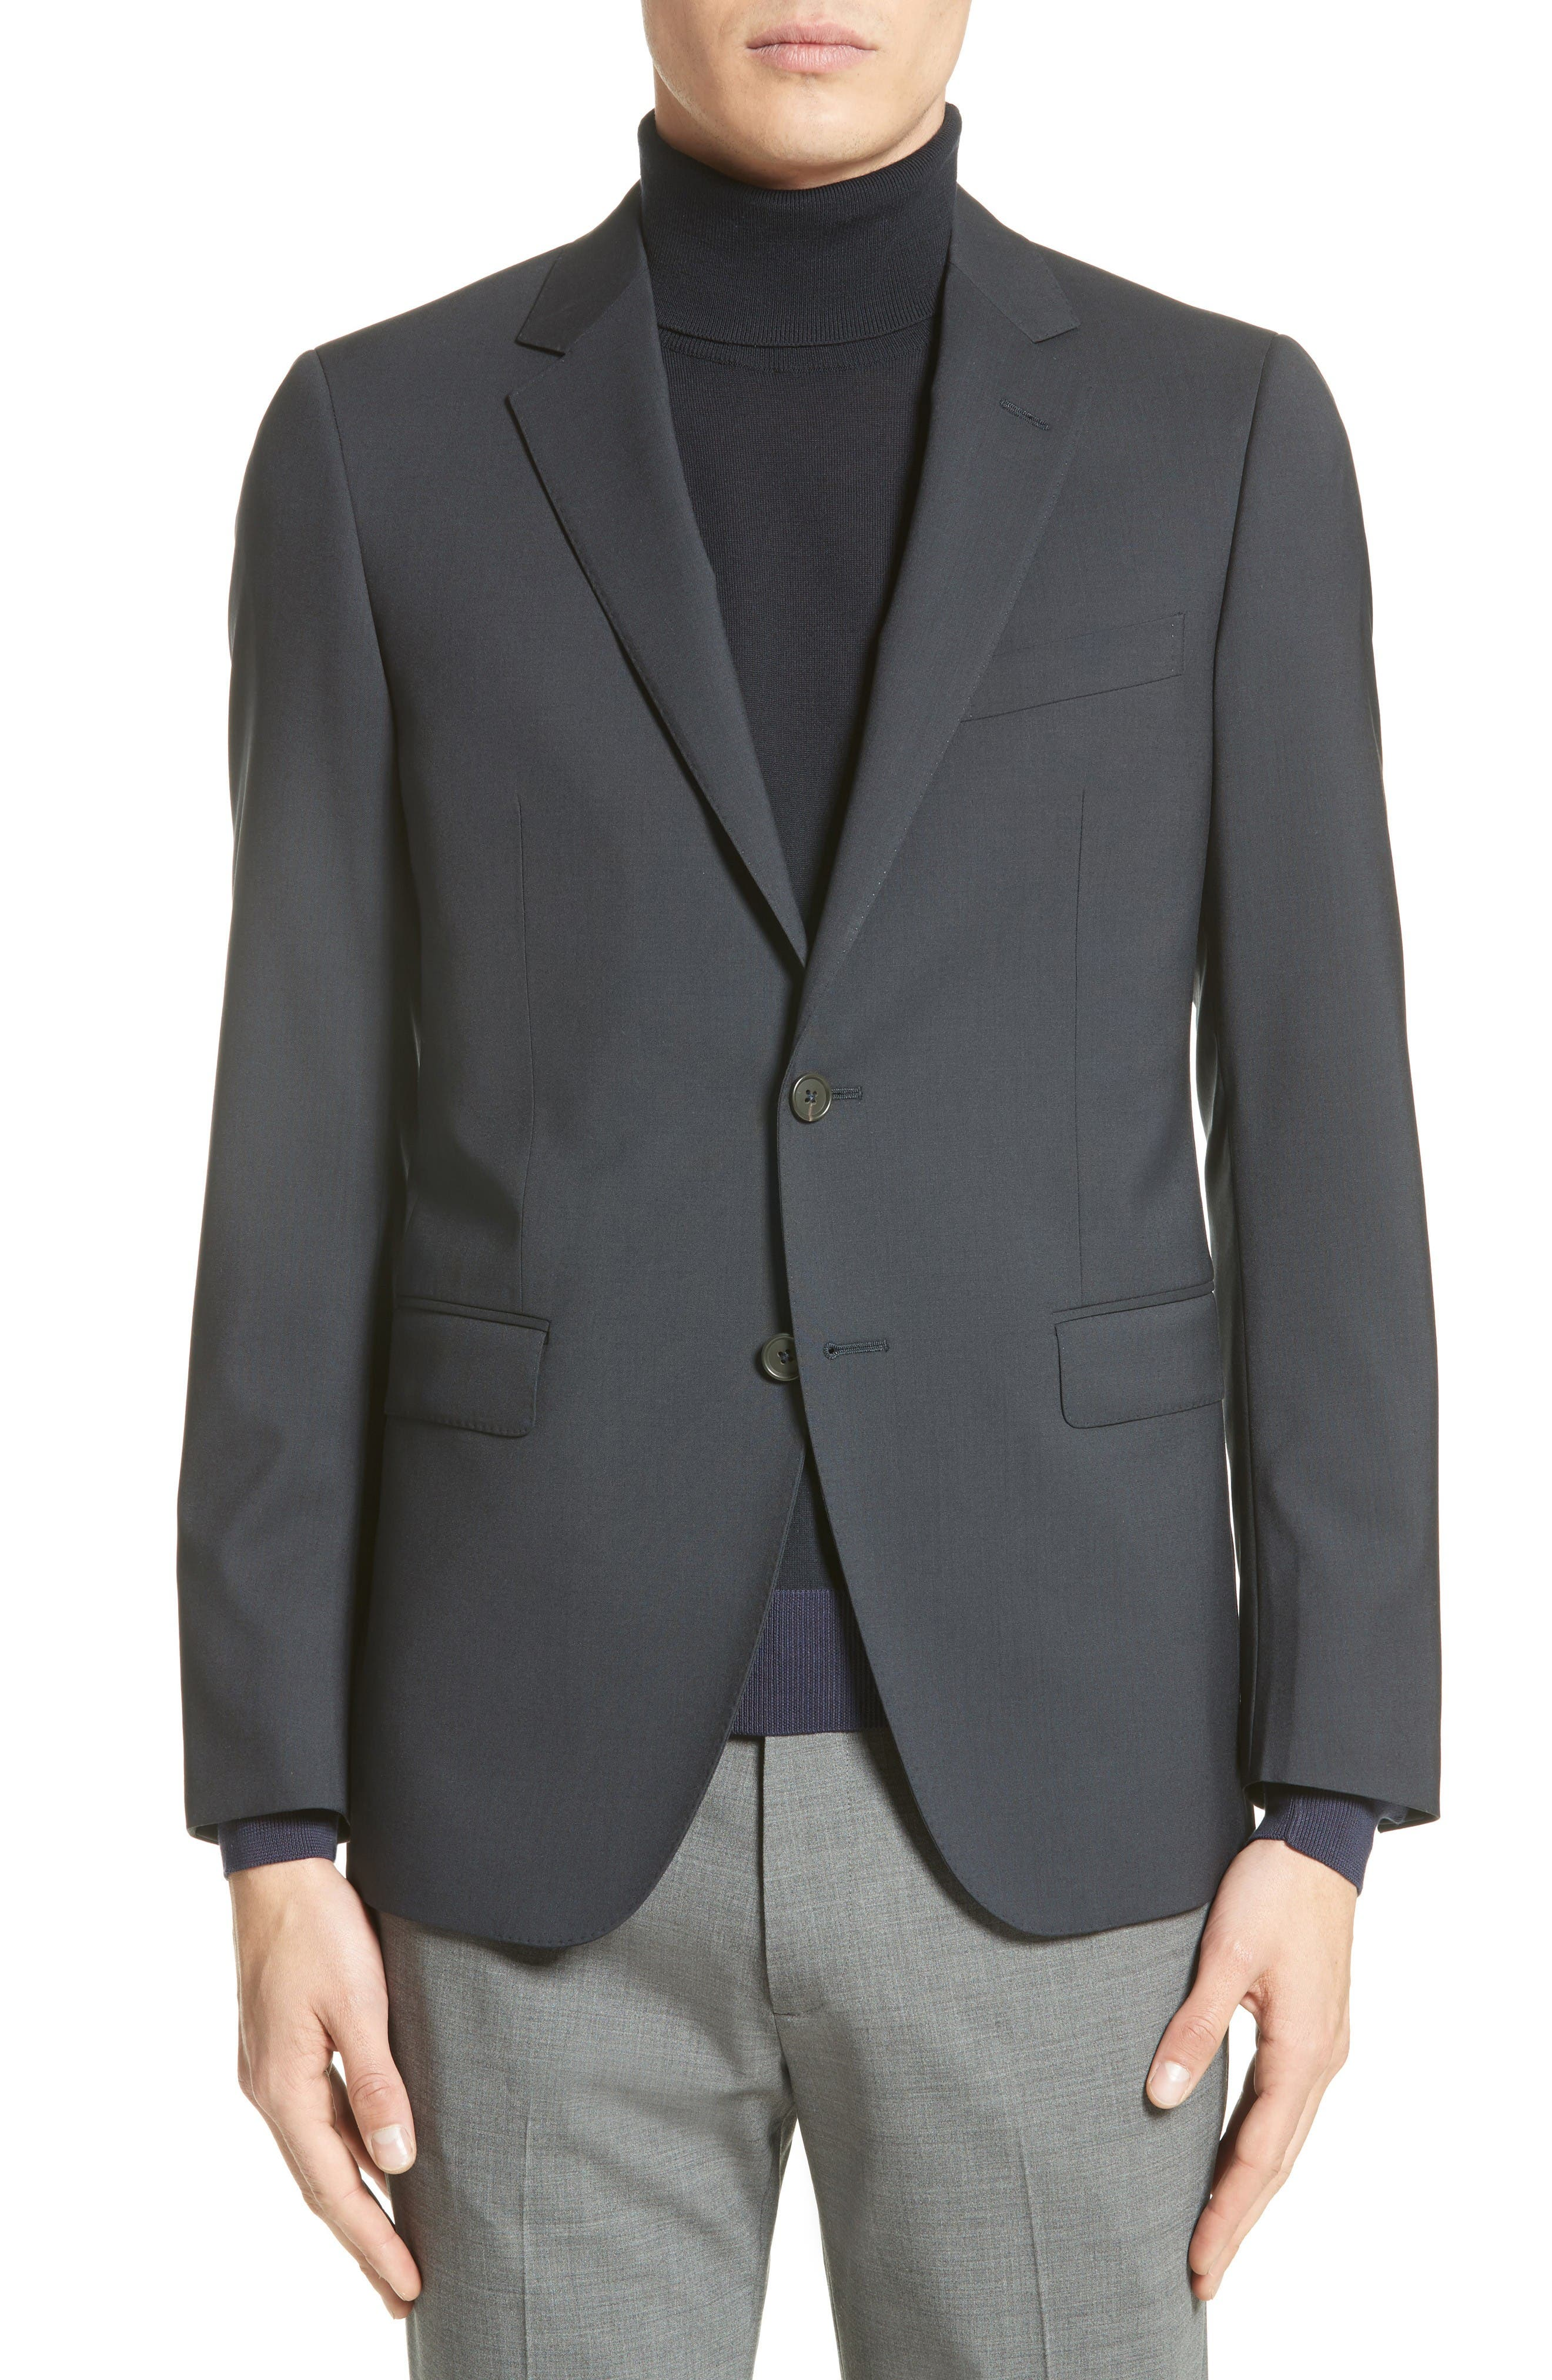 Tropical Wool Suit Jacket,                             Main thumbnail 1, color,                             NAVY